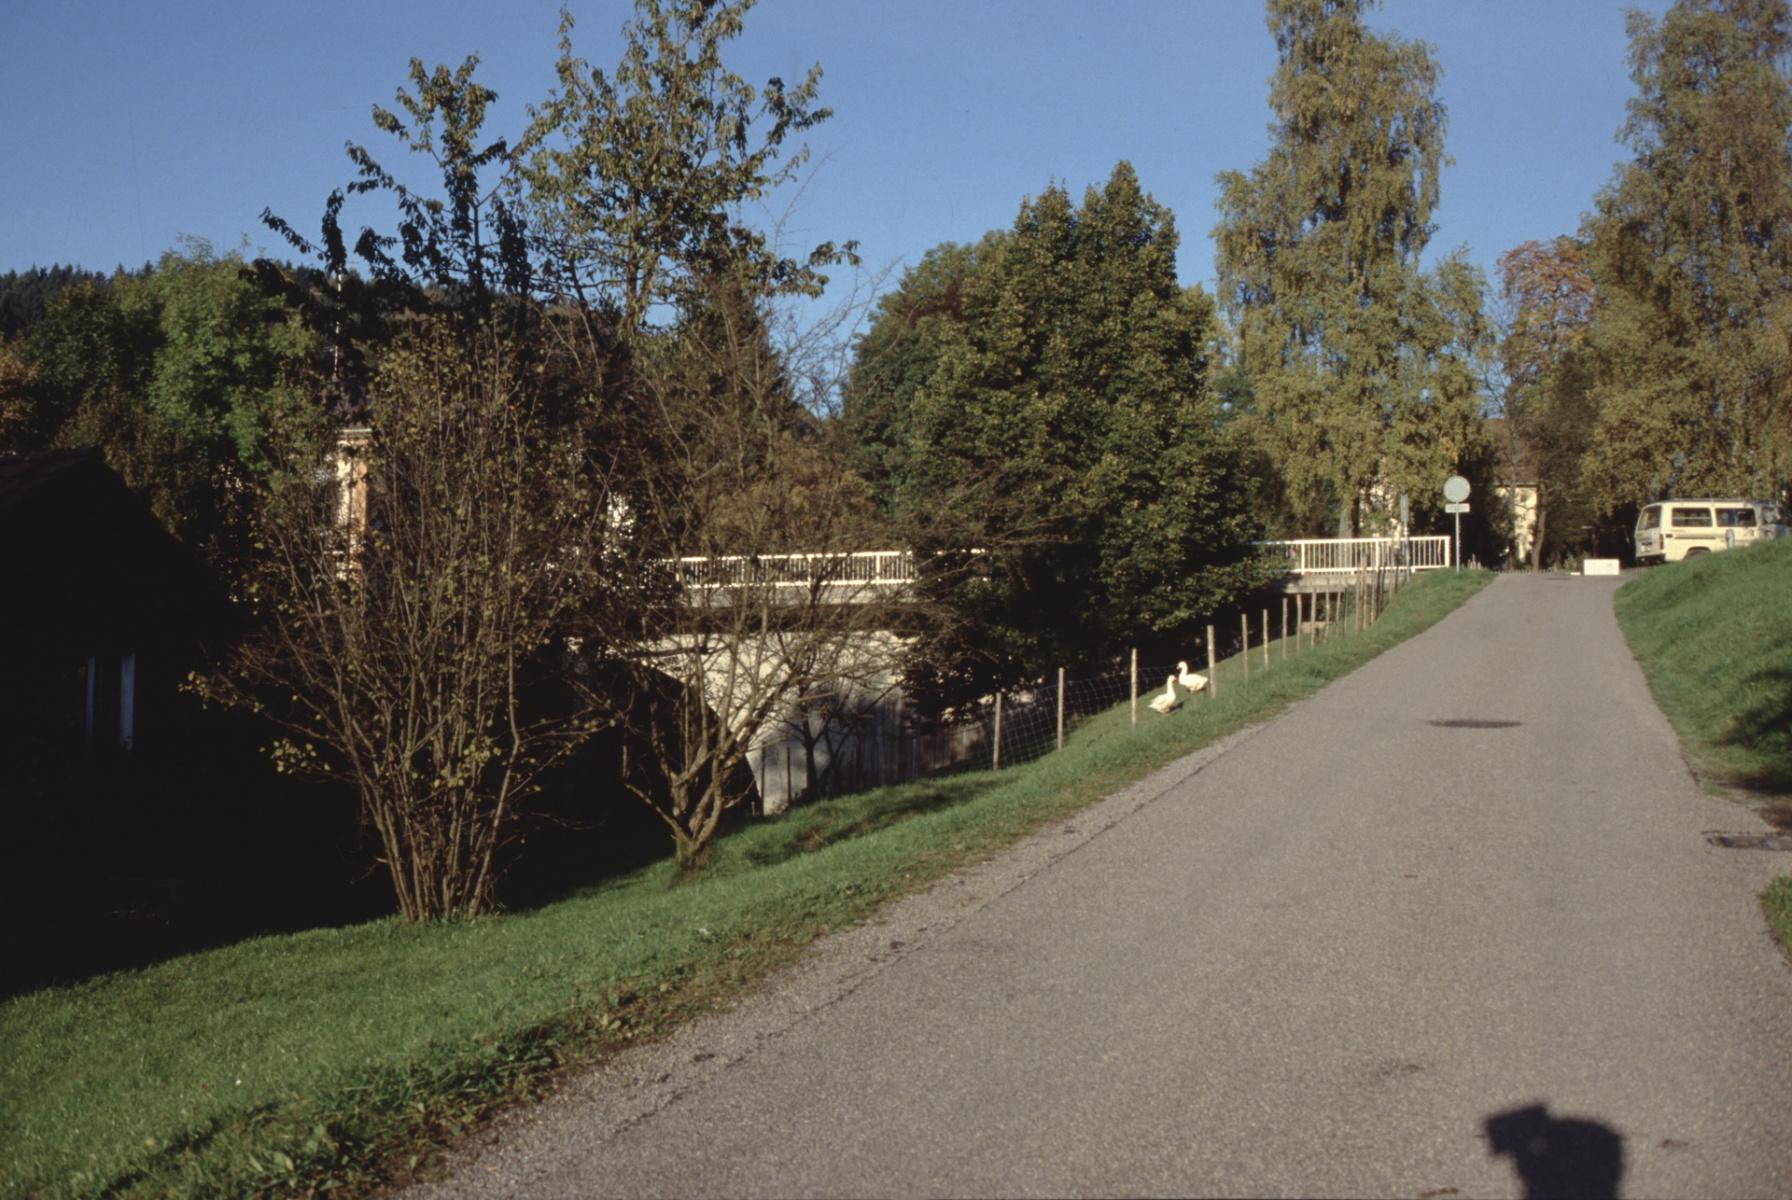 Bahnhofbrücke, Mühlerainstr